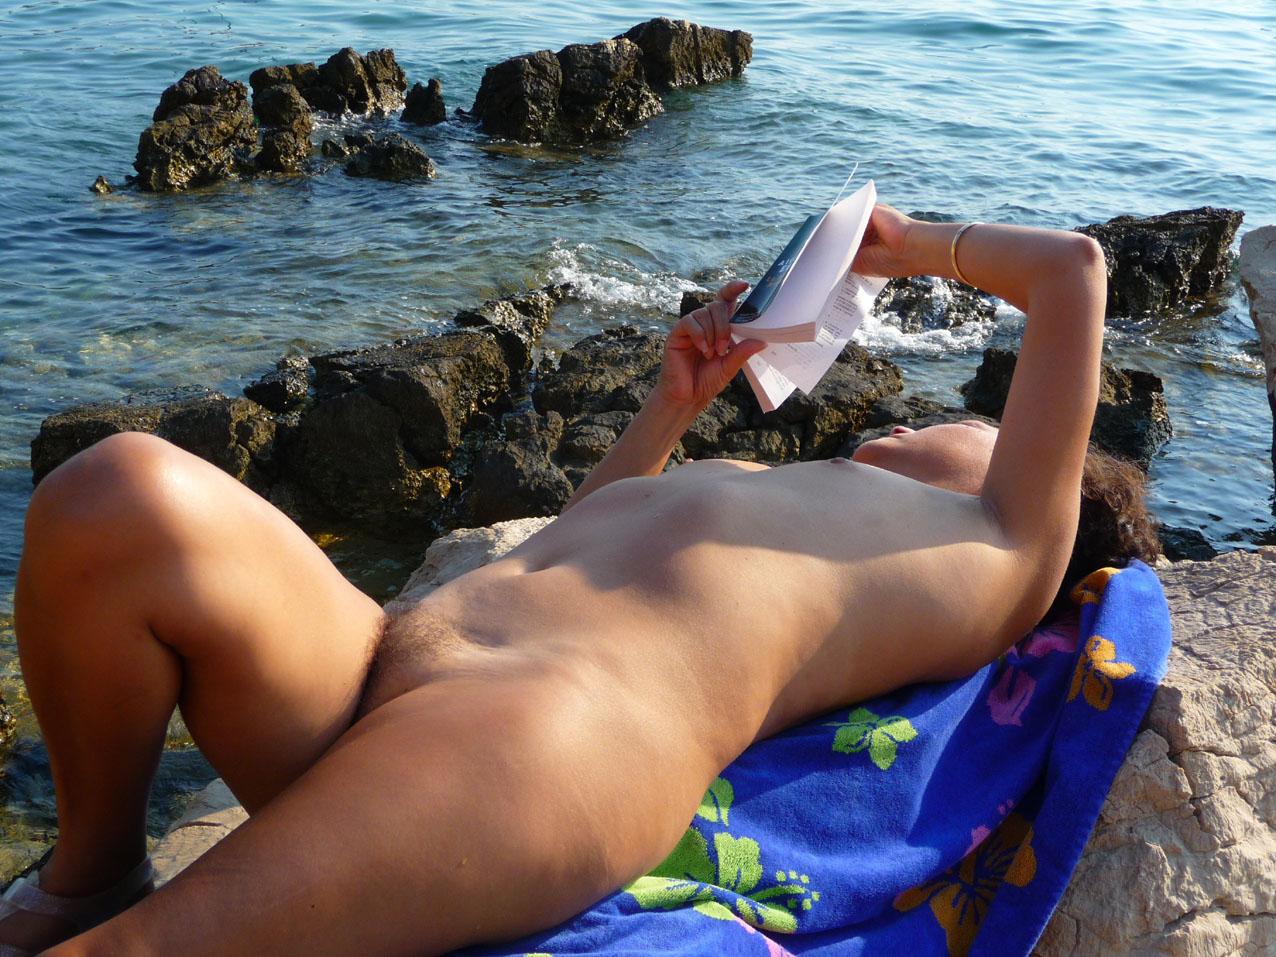 porno espagnol massage naturiste annecy